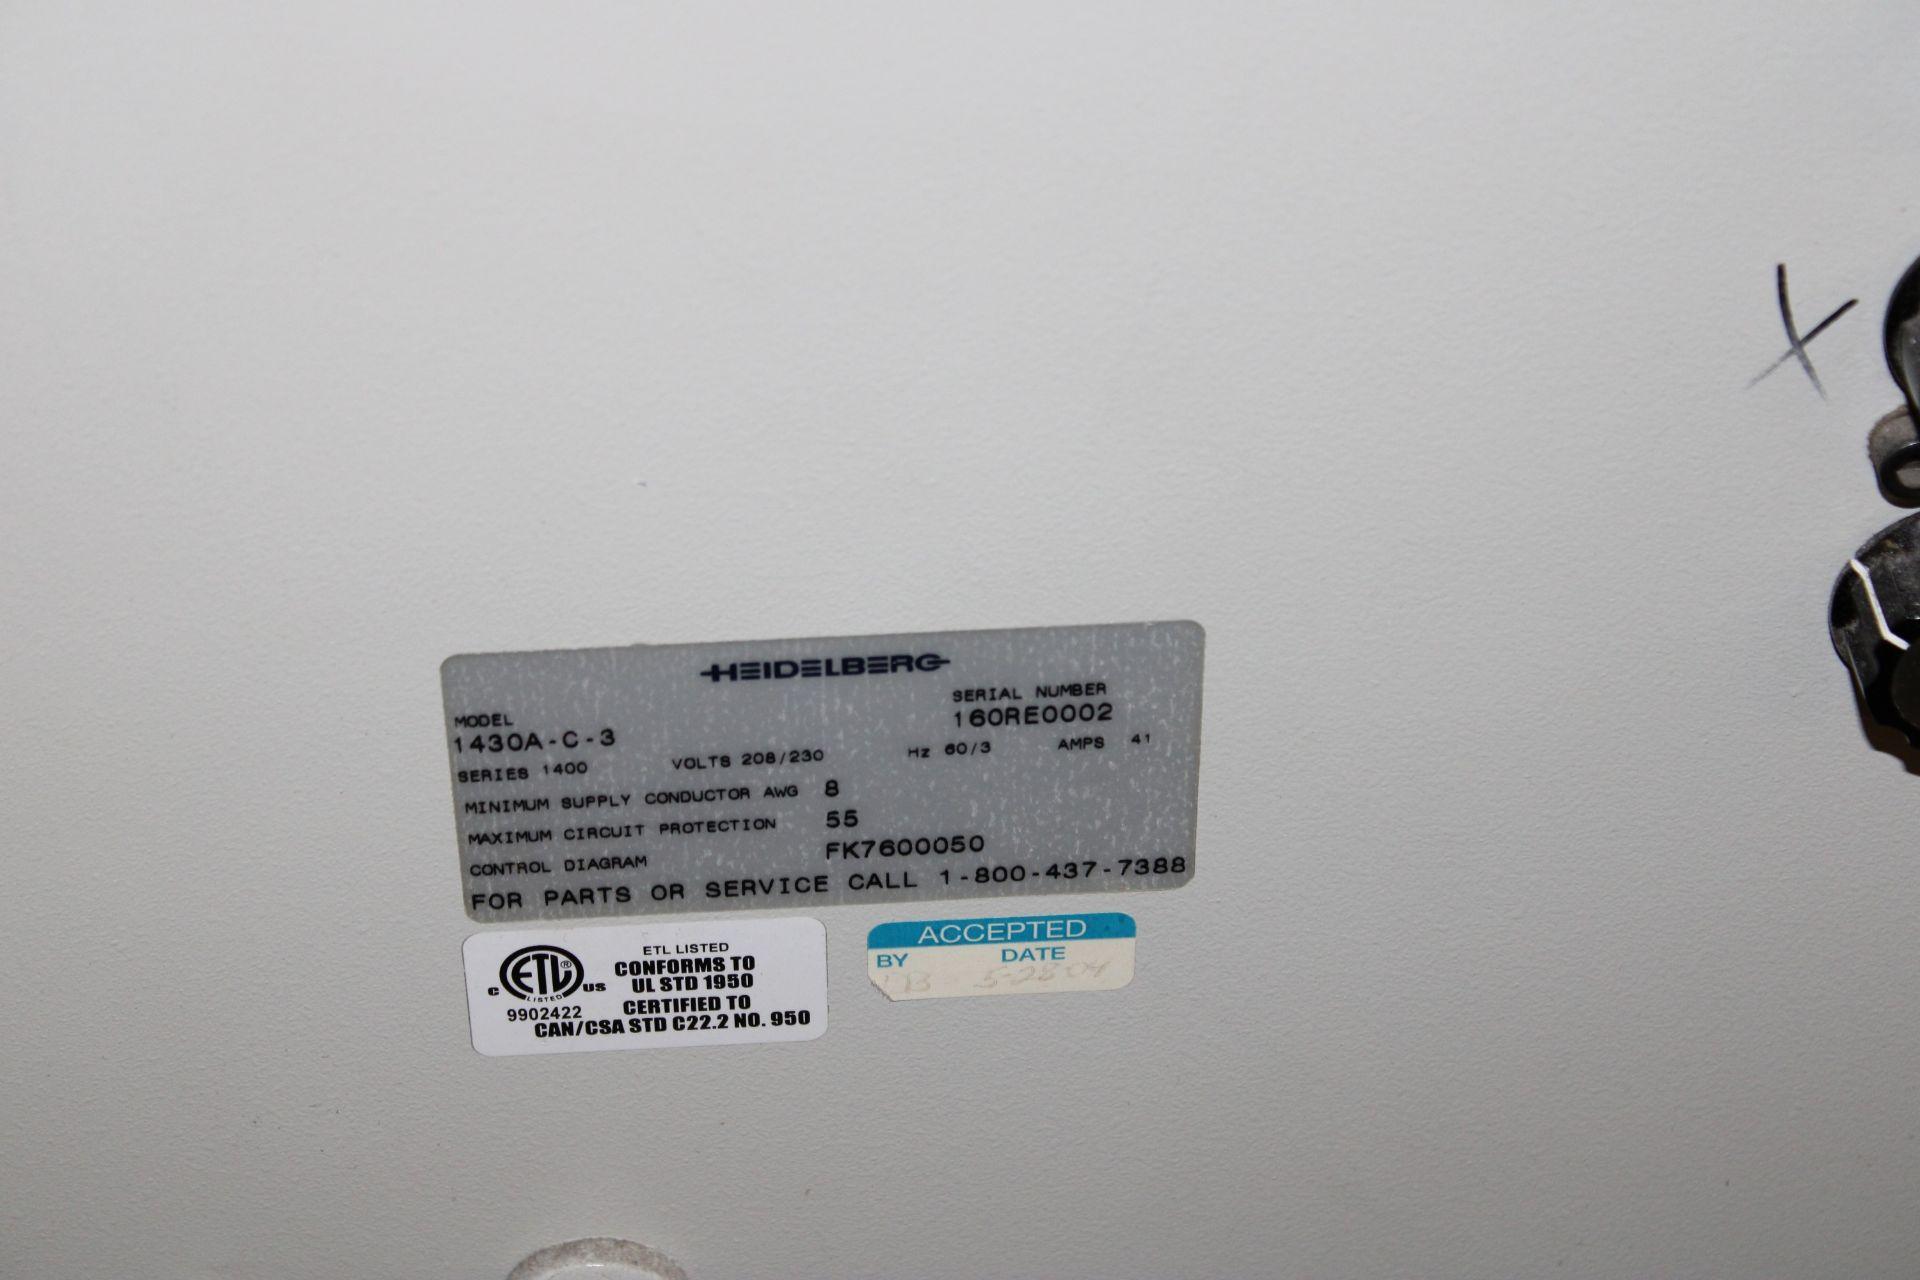 Lot 36 - Heidelberg Stahl B30 1430A-C-3 Folder s/n 160RE0002